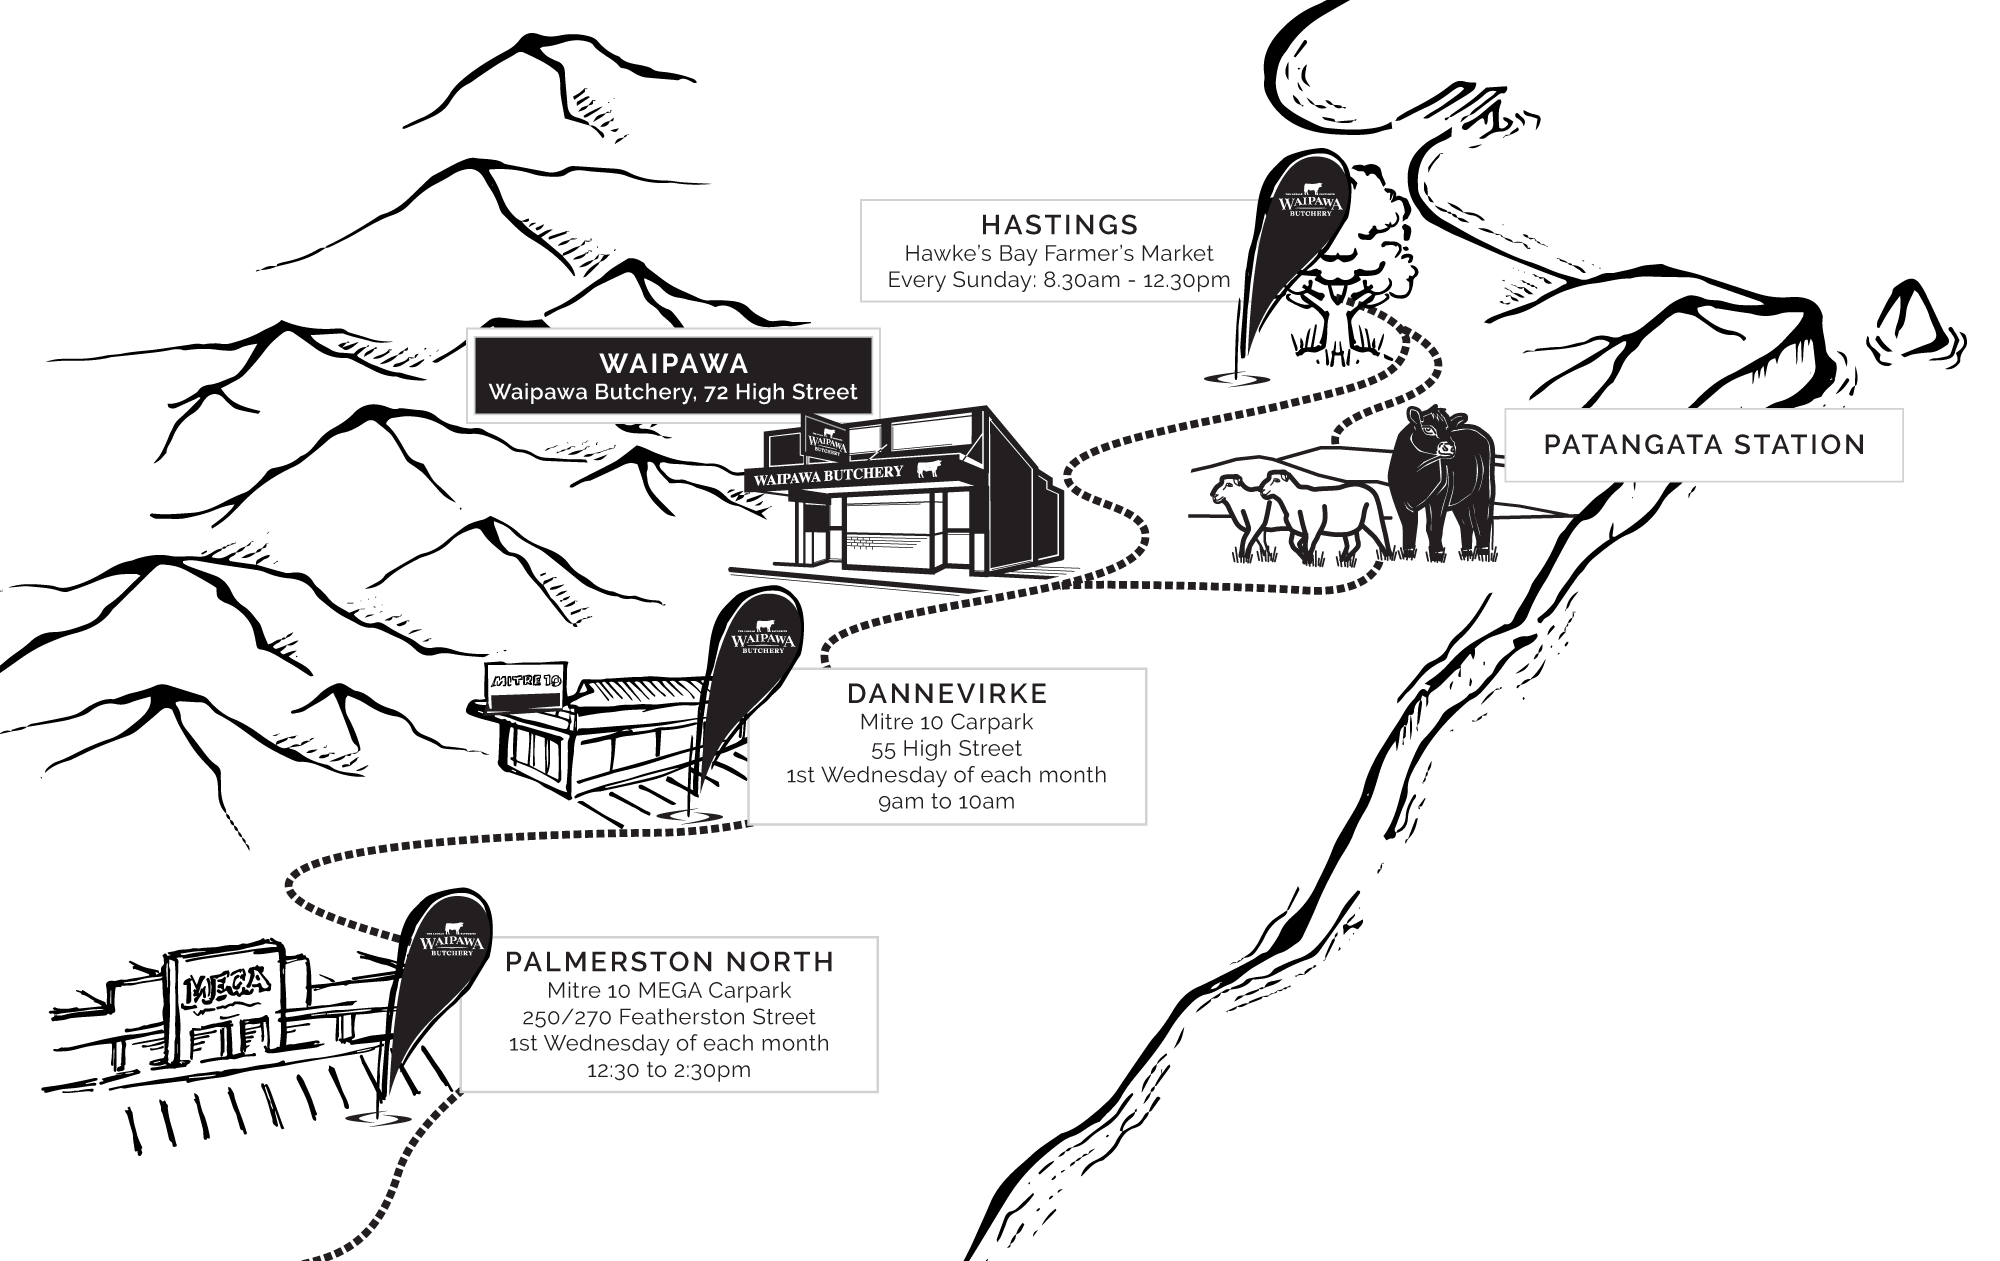 waipawa butchery pop up location map